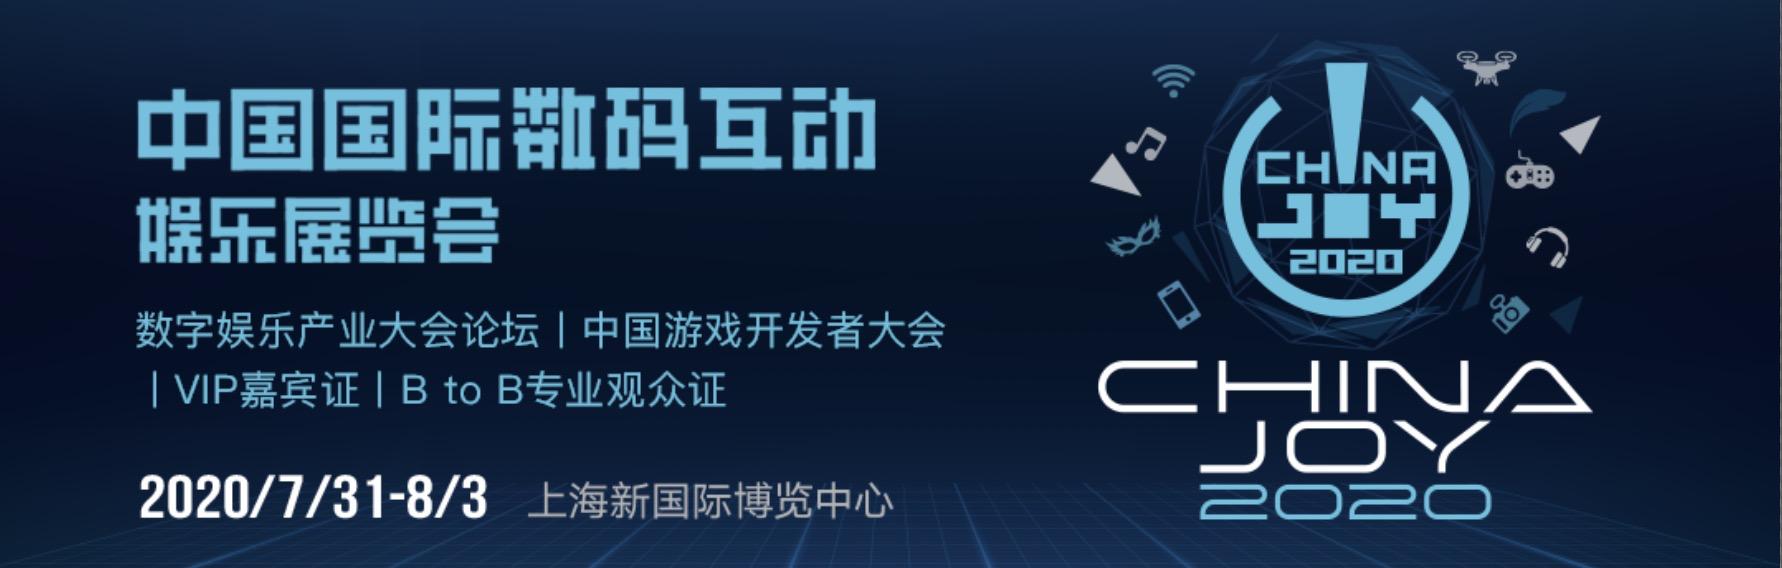 2020 chinajoy 系列活动